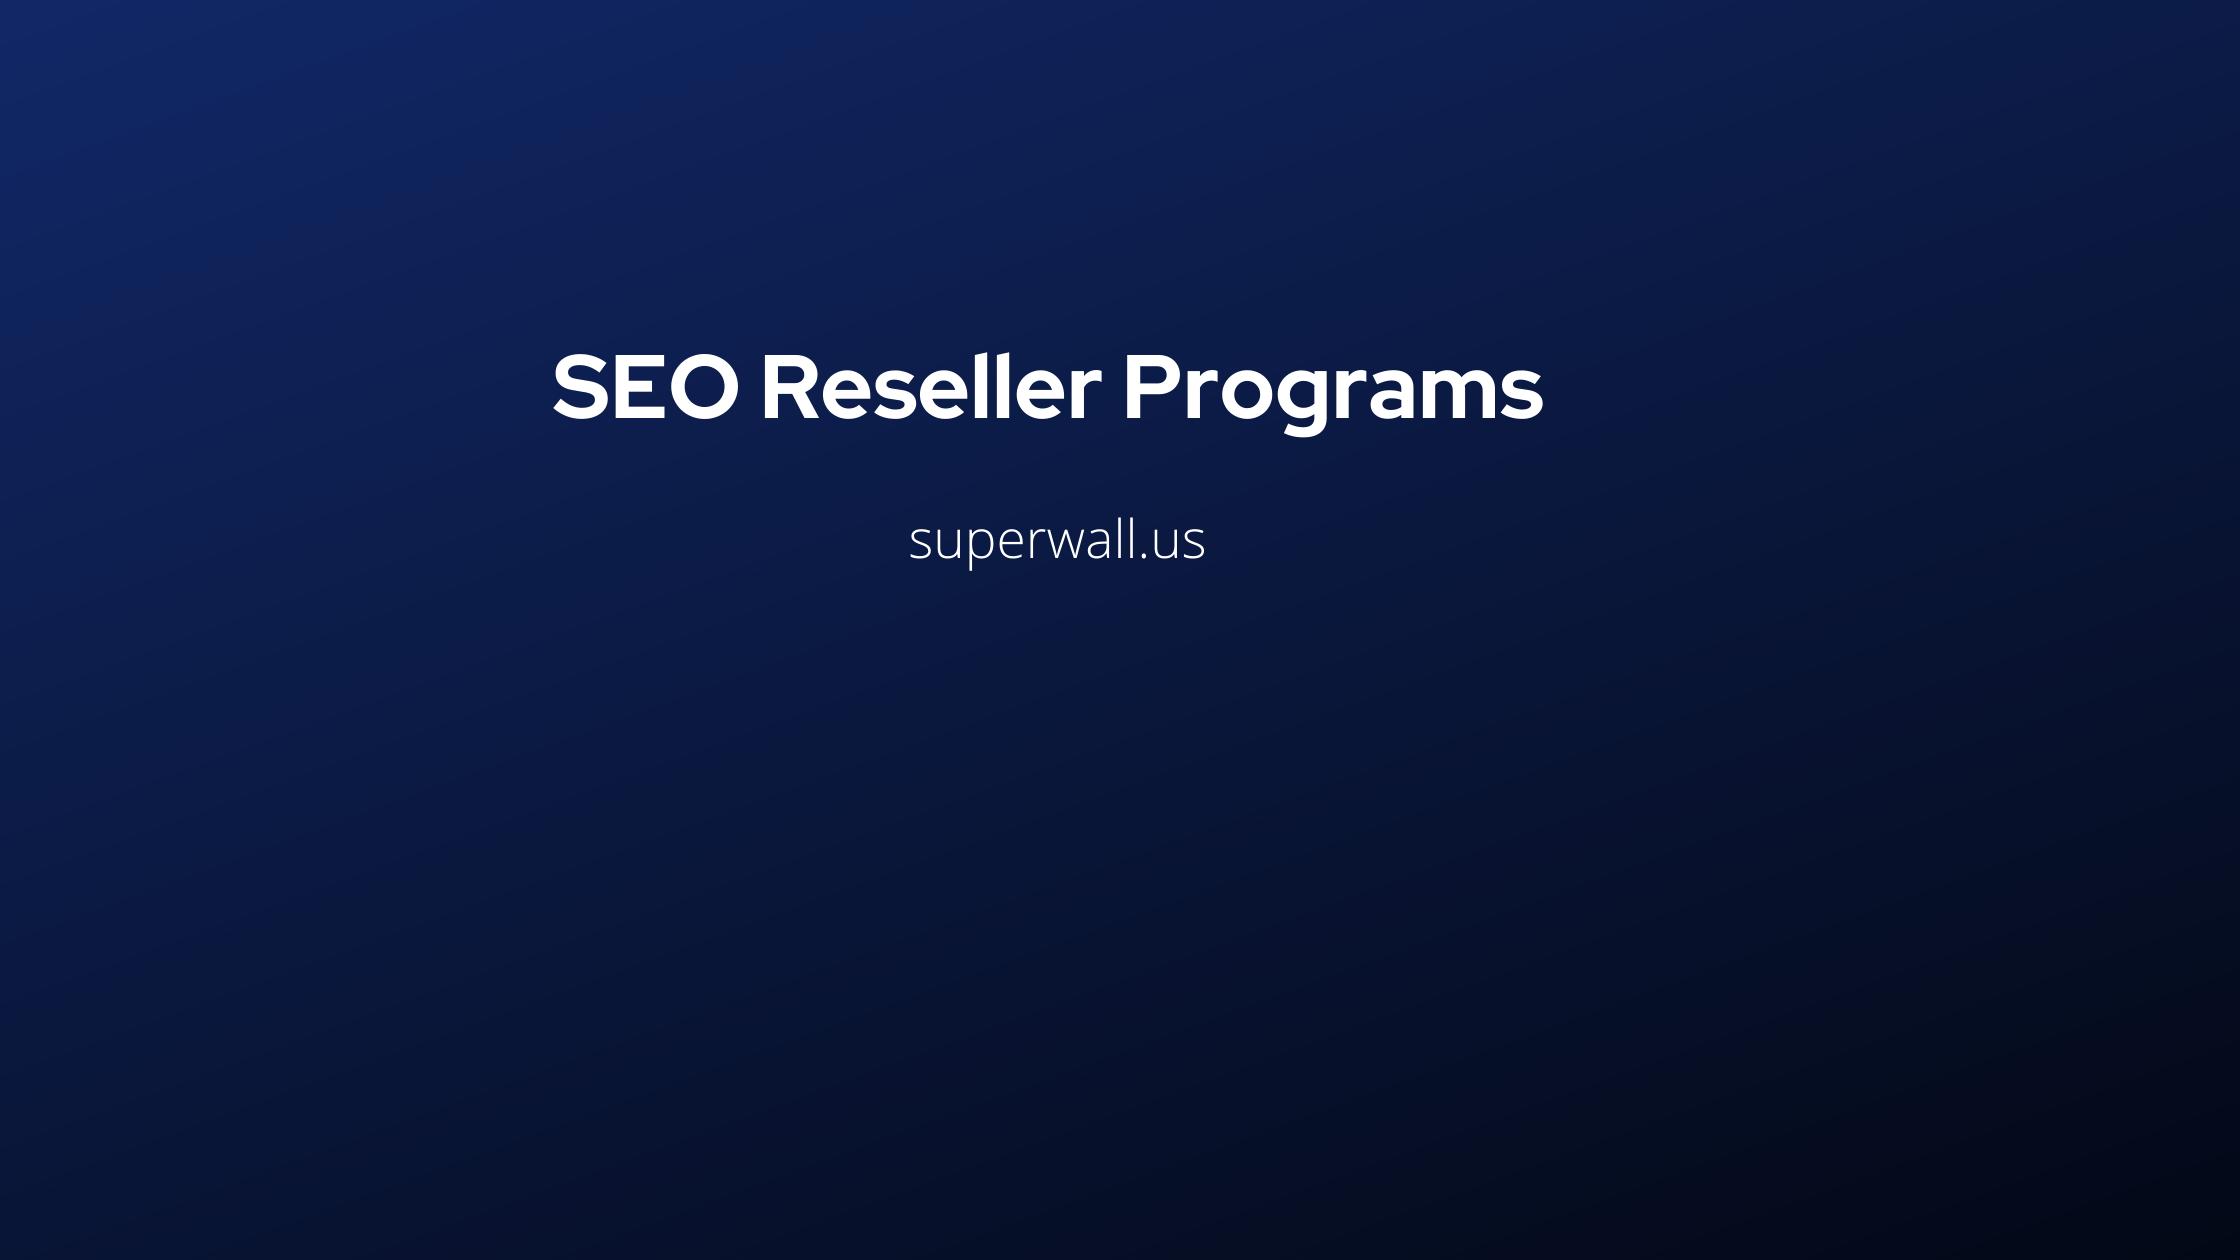 SEO Reseller Programs